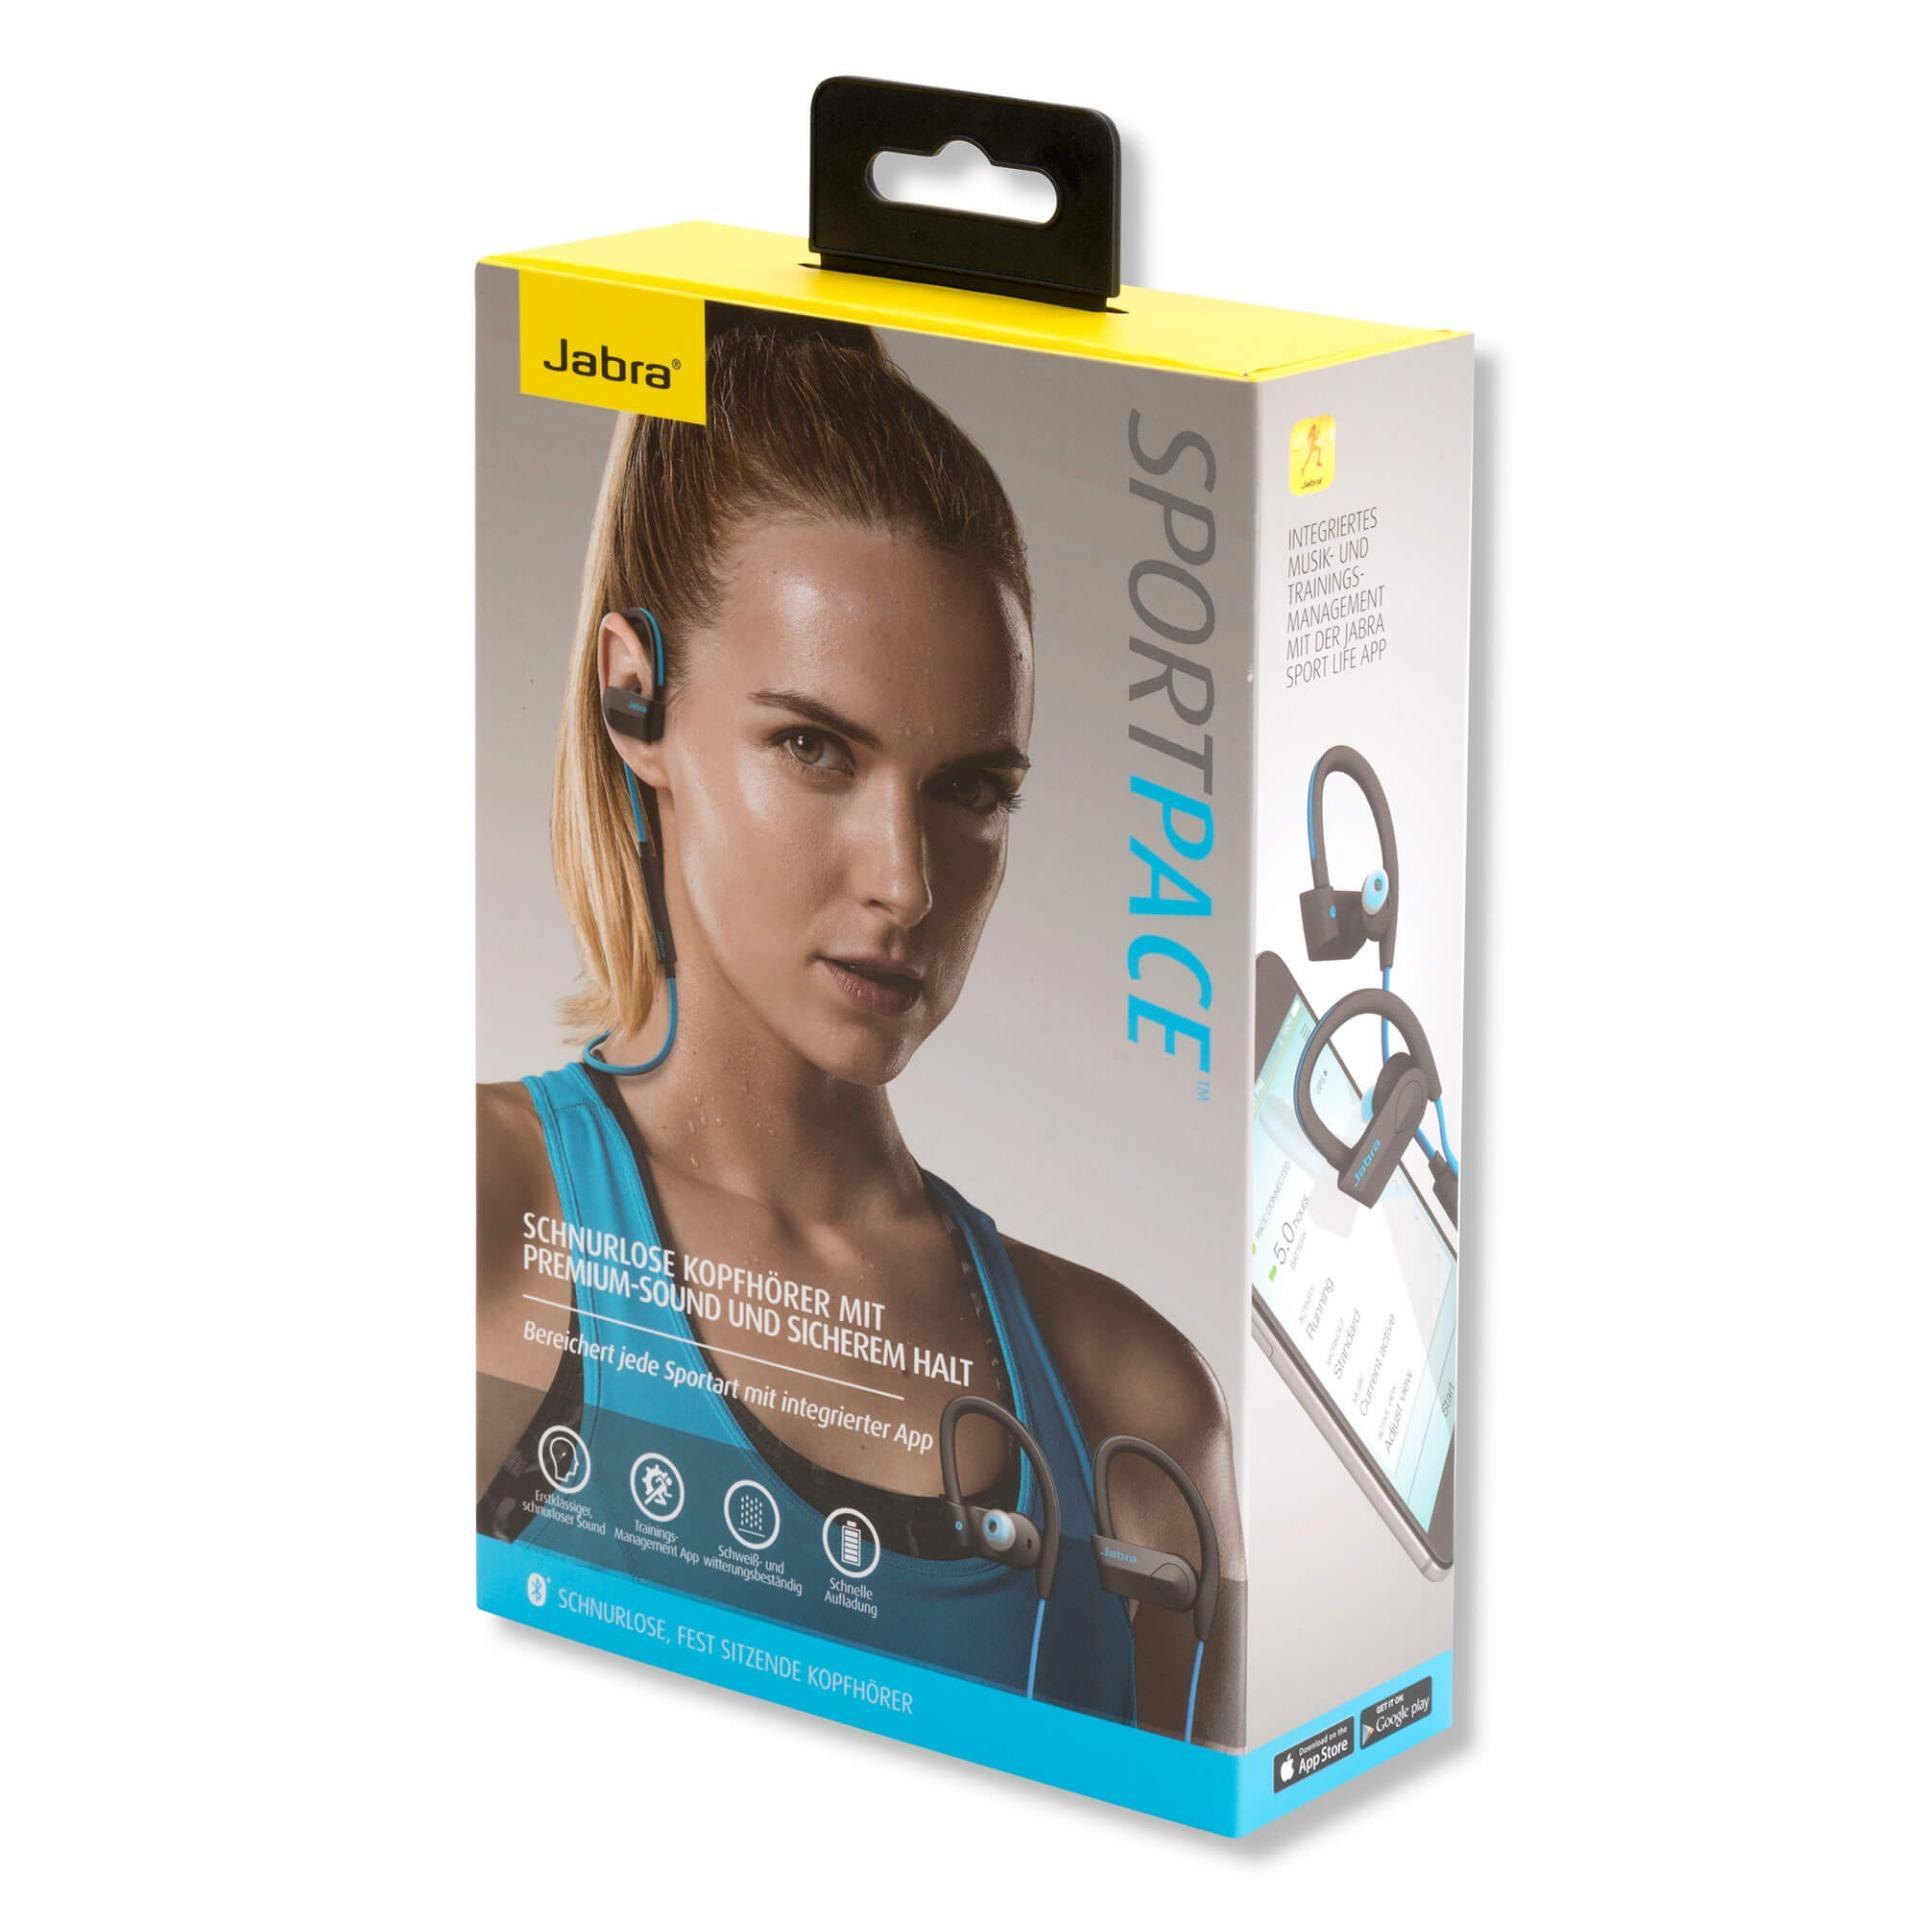 Pencari Harga Headset Bluetooth Stereo Jabra Sport Face Eshop Checker Halo Free Headphone Hitam